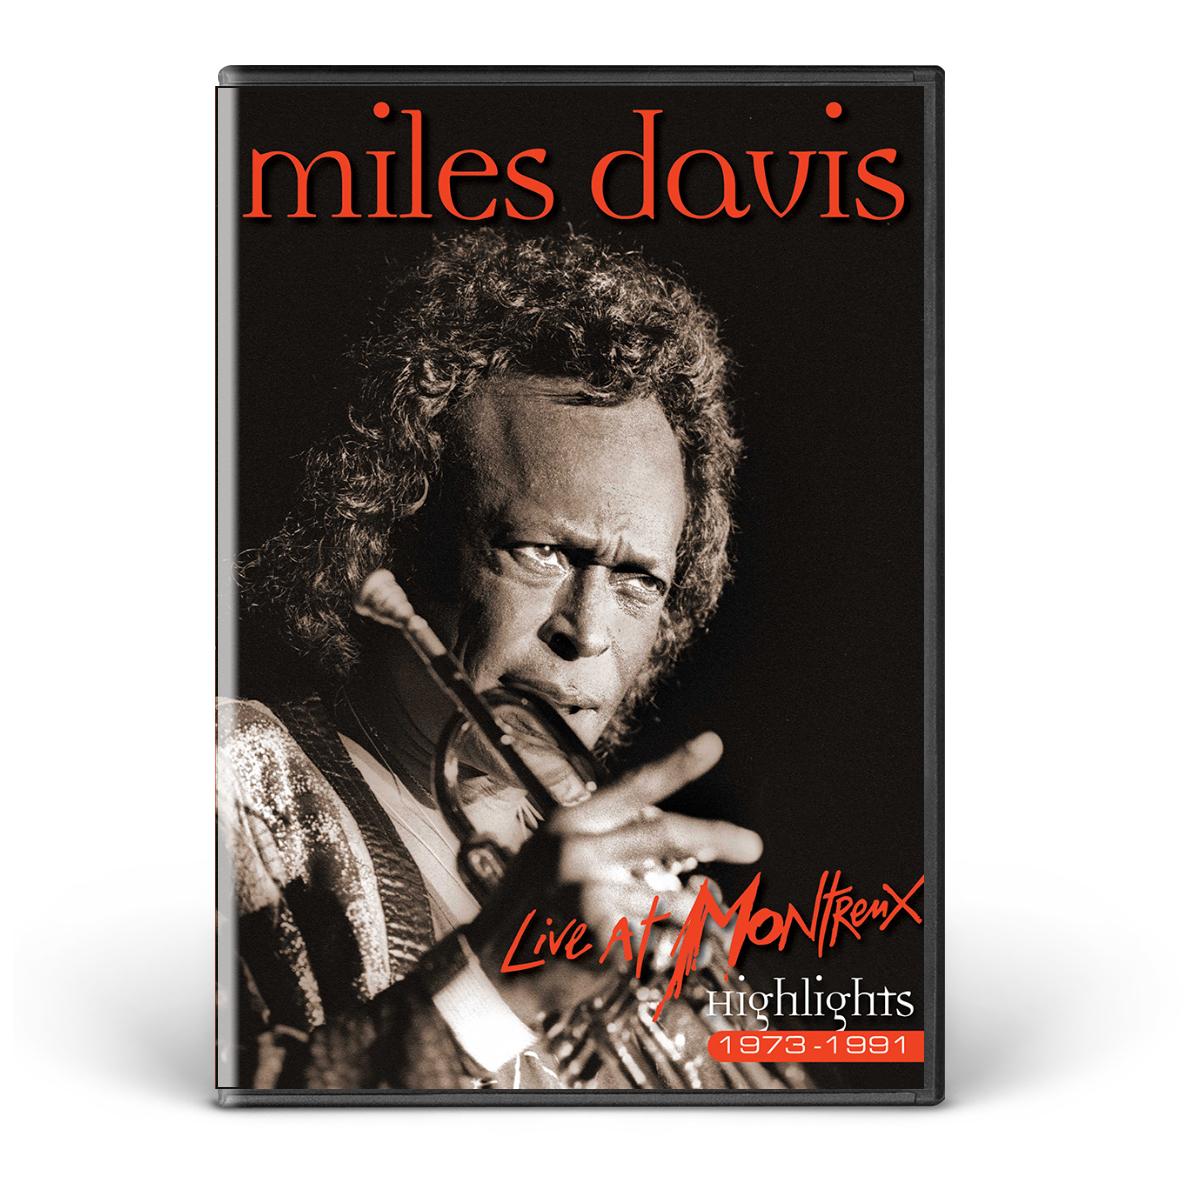 Miles Davis - Live At Montreux: Highlights 1973-1991 DVD